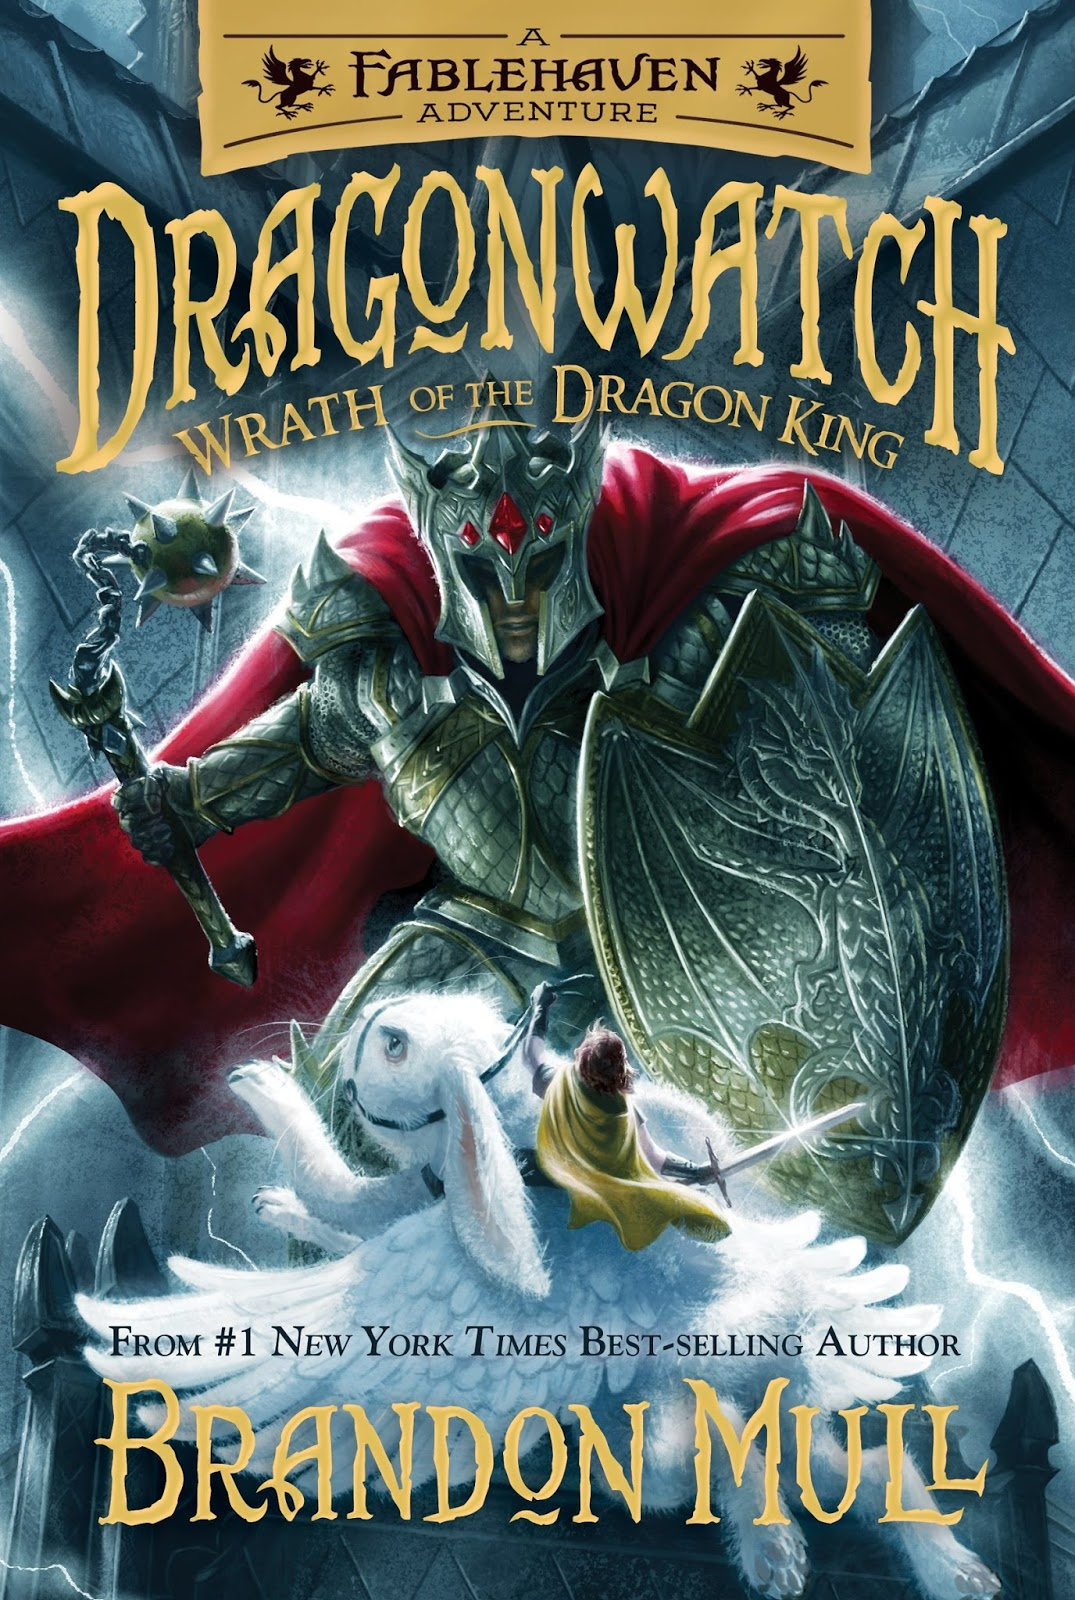 Dragonwatch: Wrath of the Dragon King by Brandon Mull